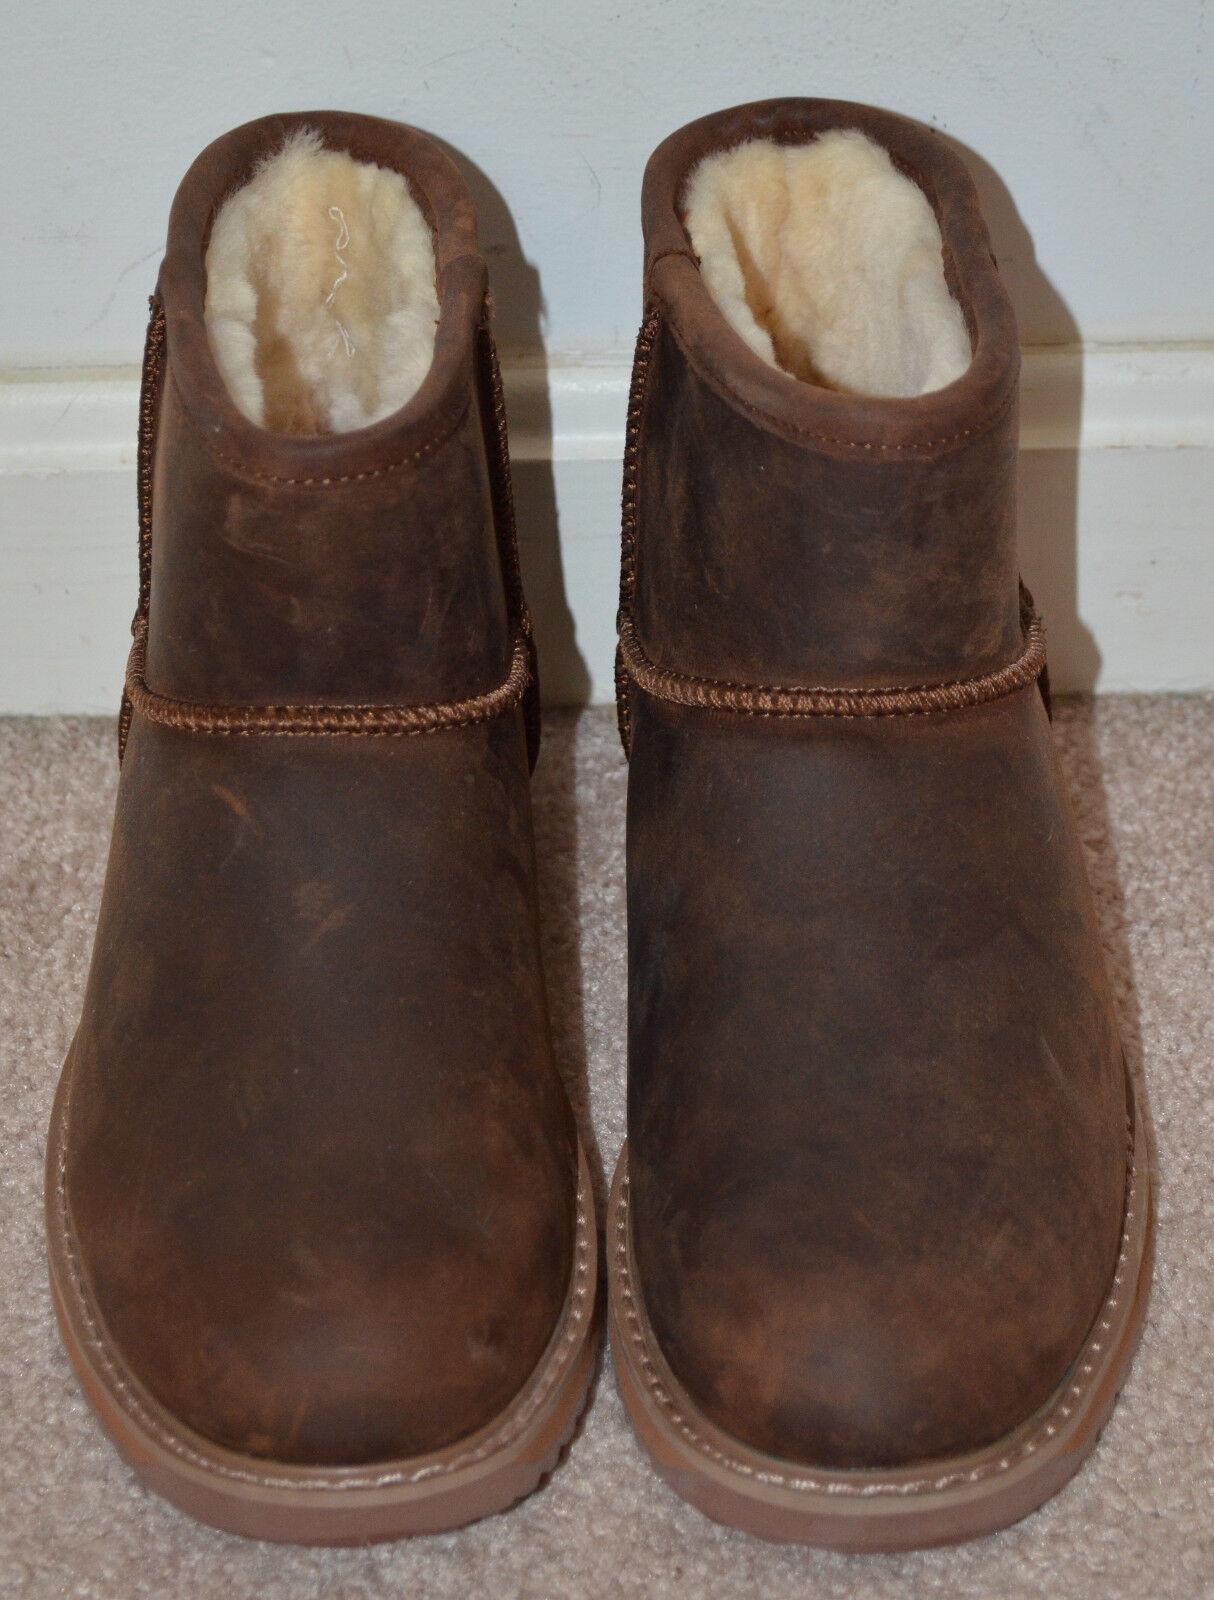 Emu Australia Girls Brown Sheepskin Waterproof Ankle Boots S